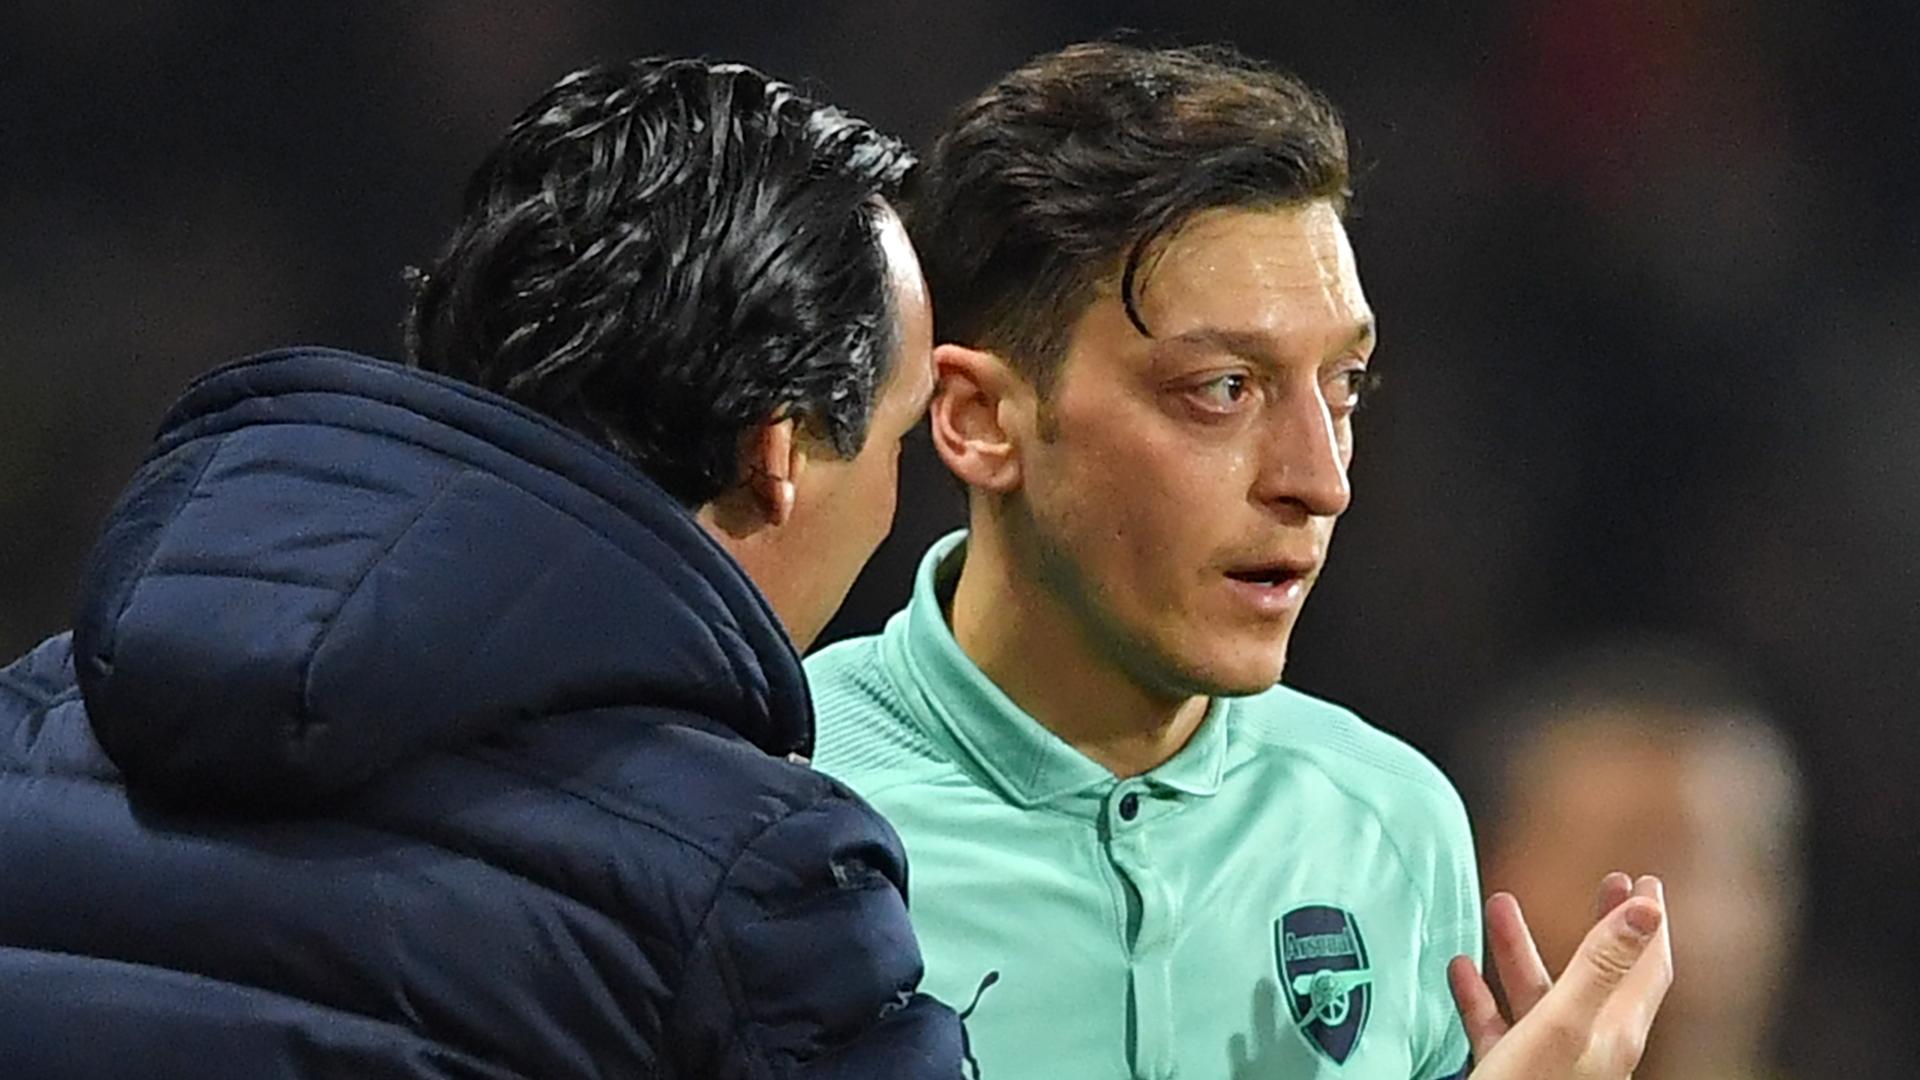 Unai Emery, Mesut Ozil, Arsenal